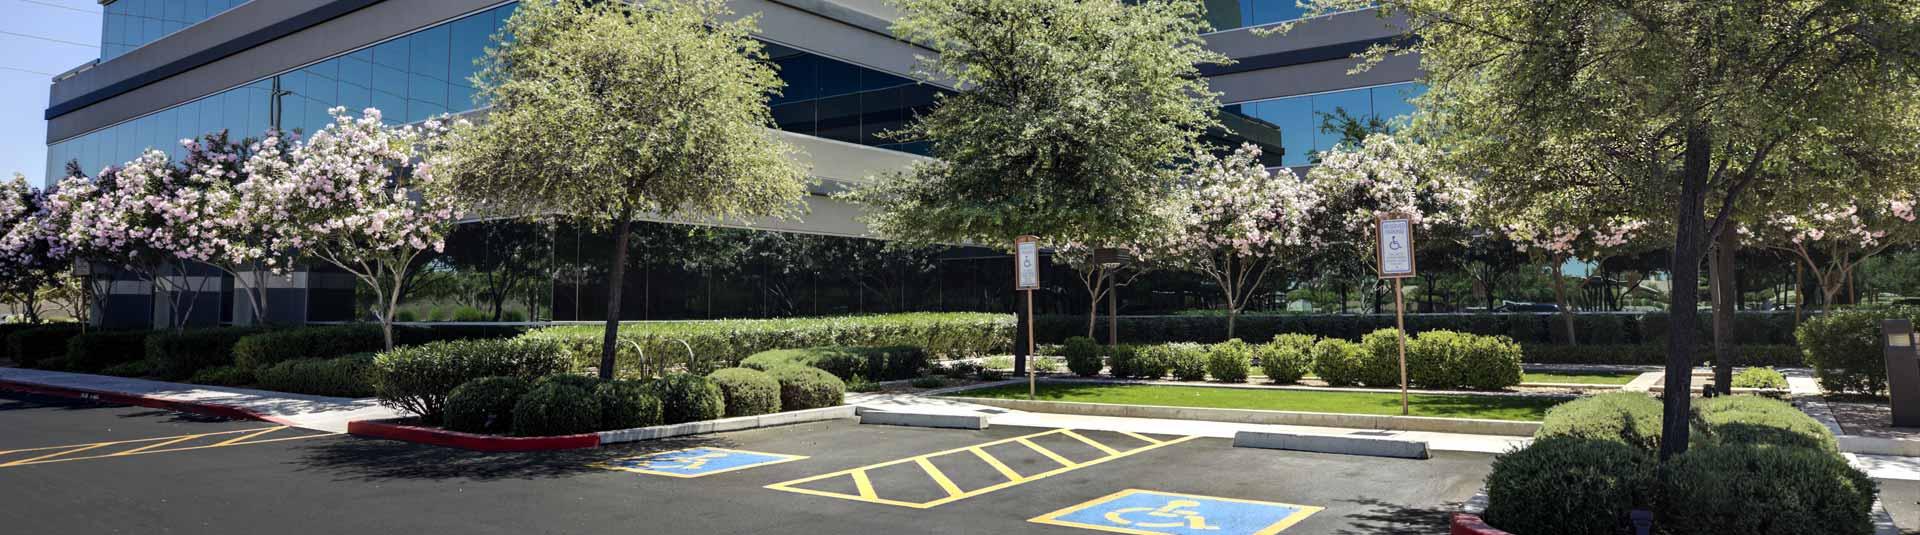 Commercial Landscaping Richmond Va